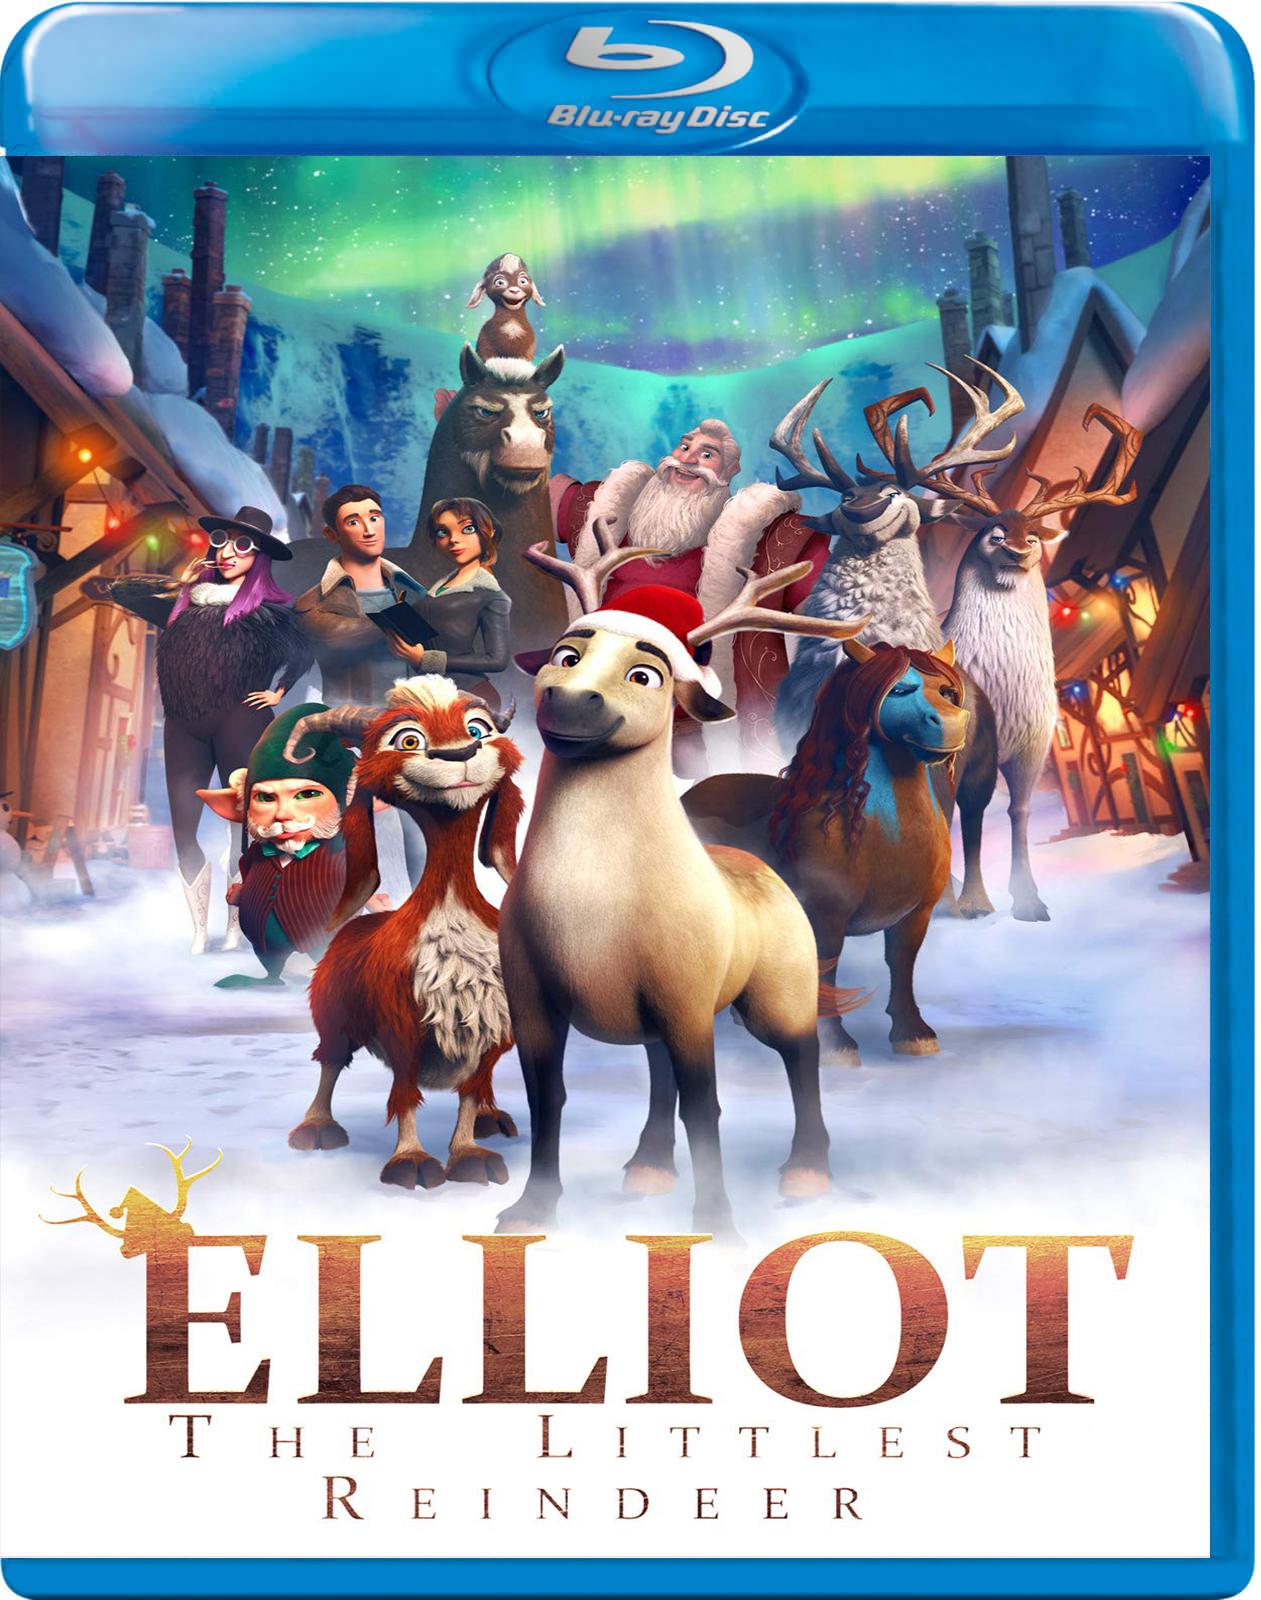 Elliot the Littlest Reindeer [2018] [BD25] [Latino]